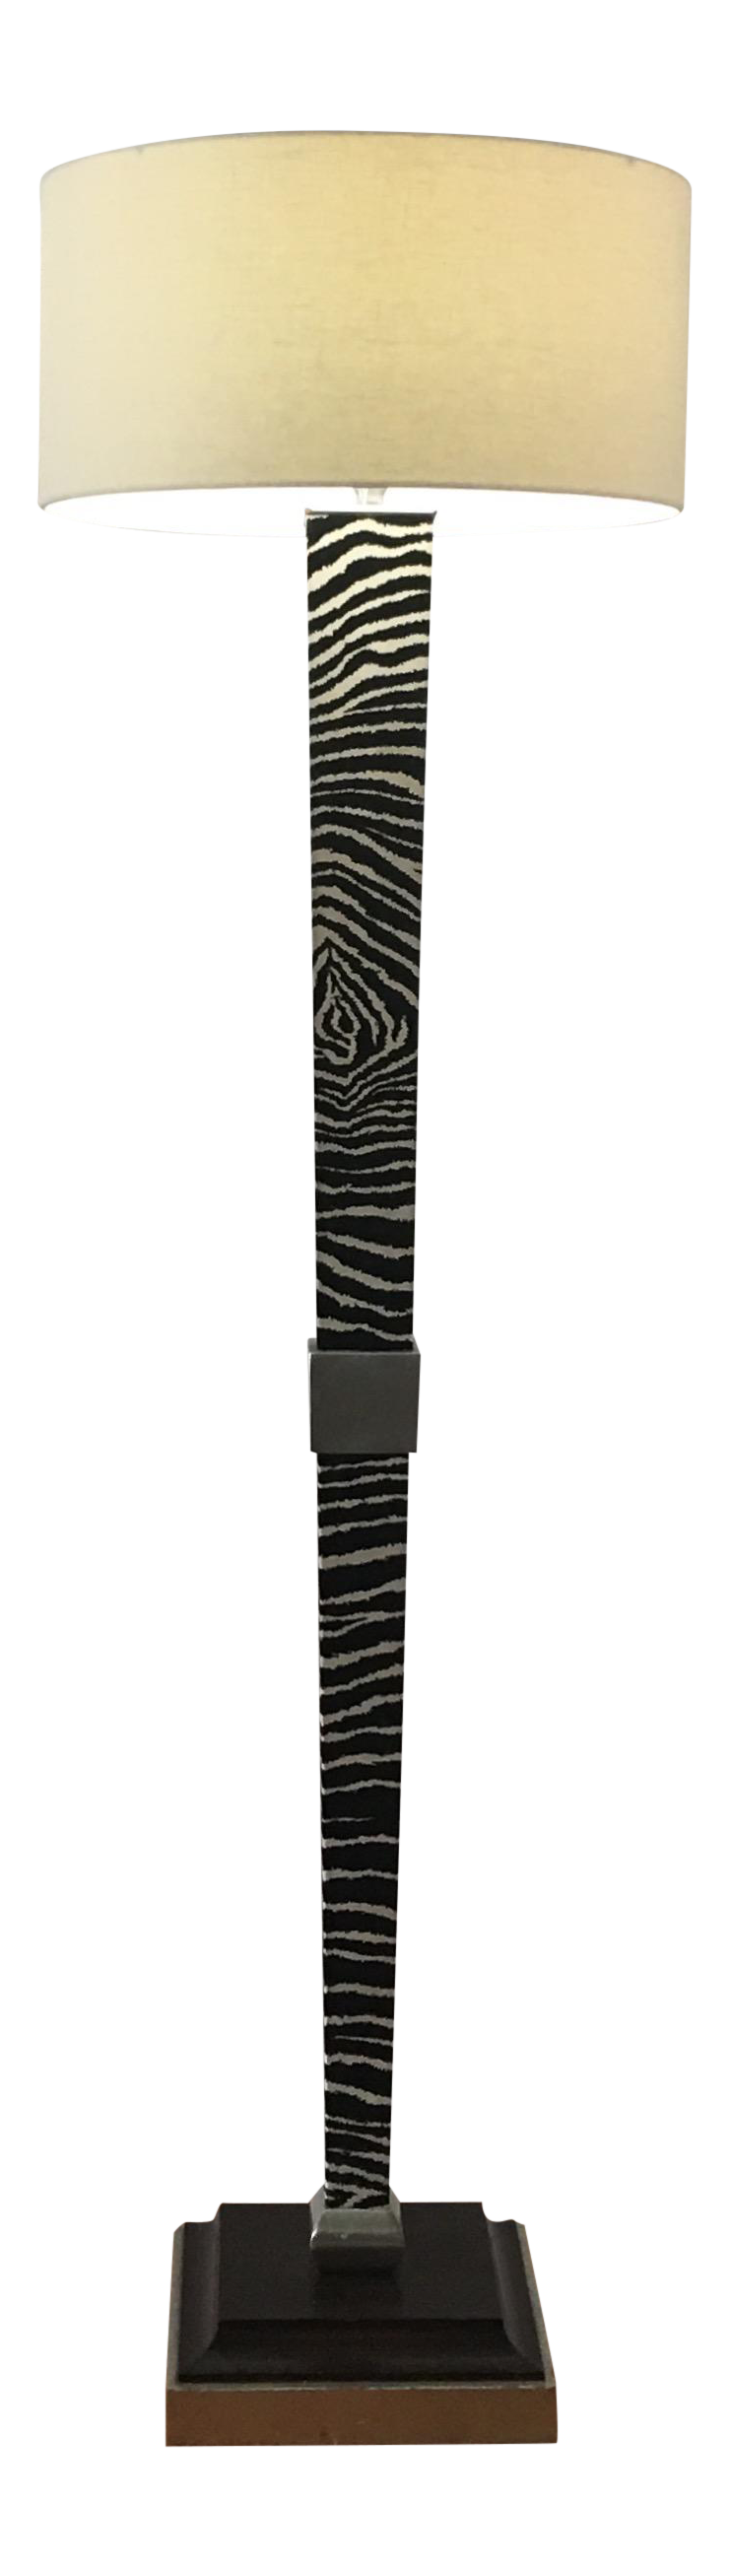 Zebra Floor Lamps : Black and white zebra floor lamp chairish